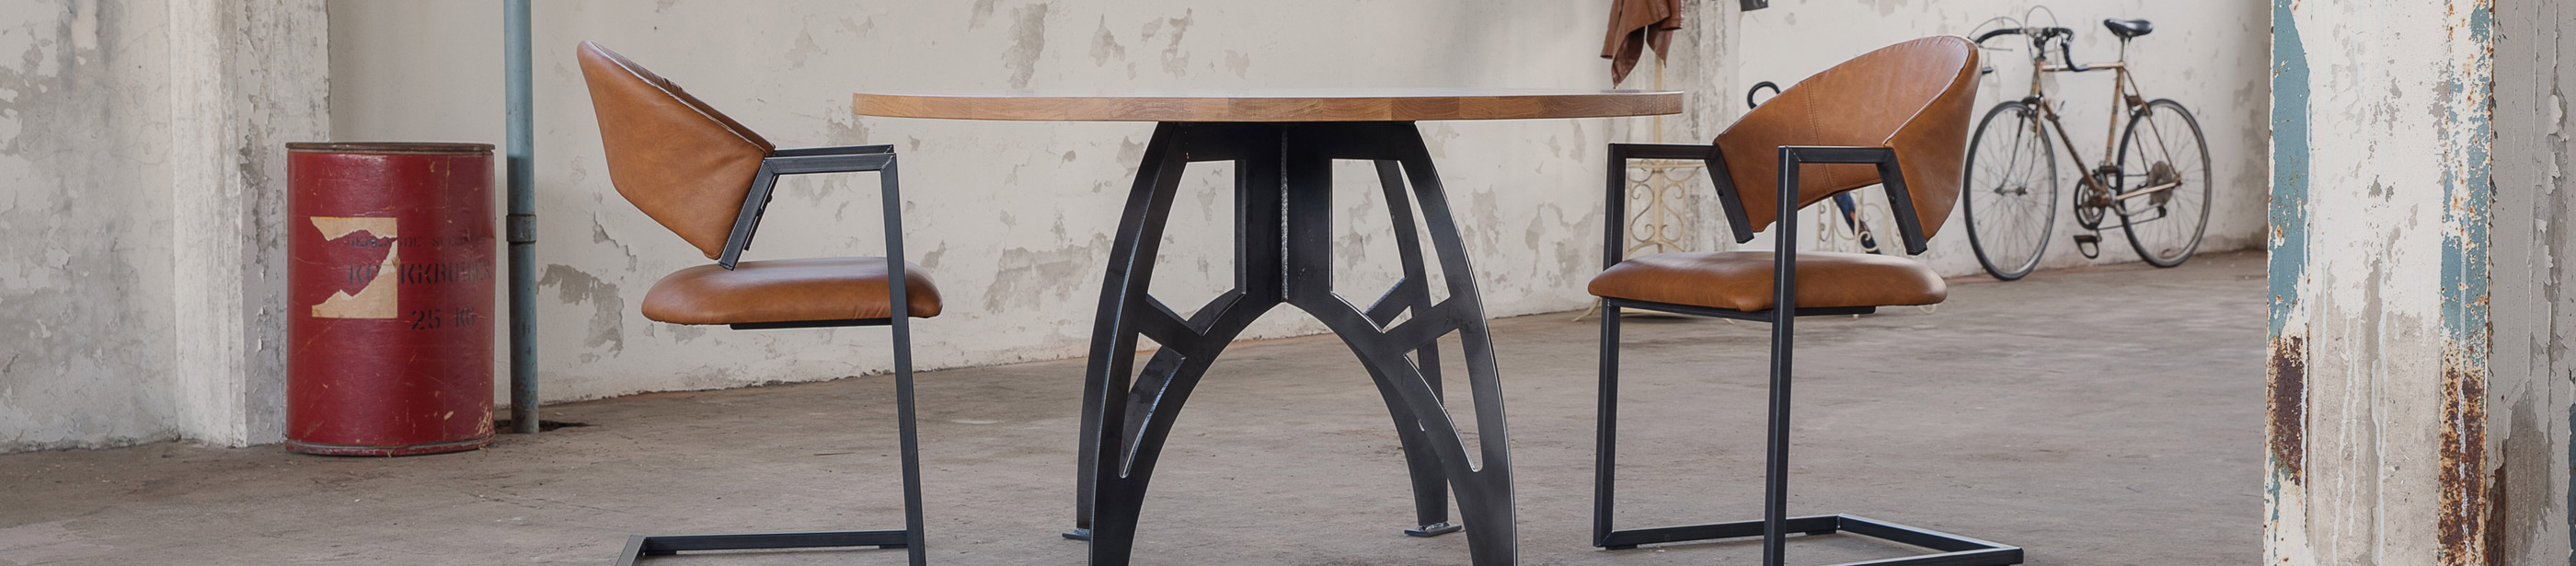 Tafelfabriek-BB-4